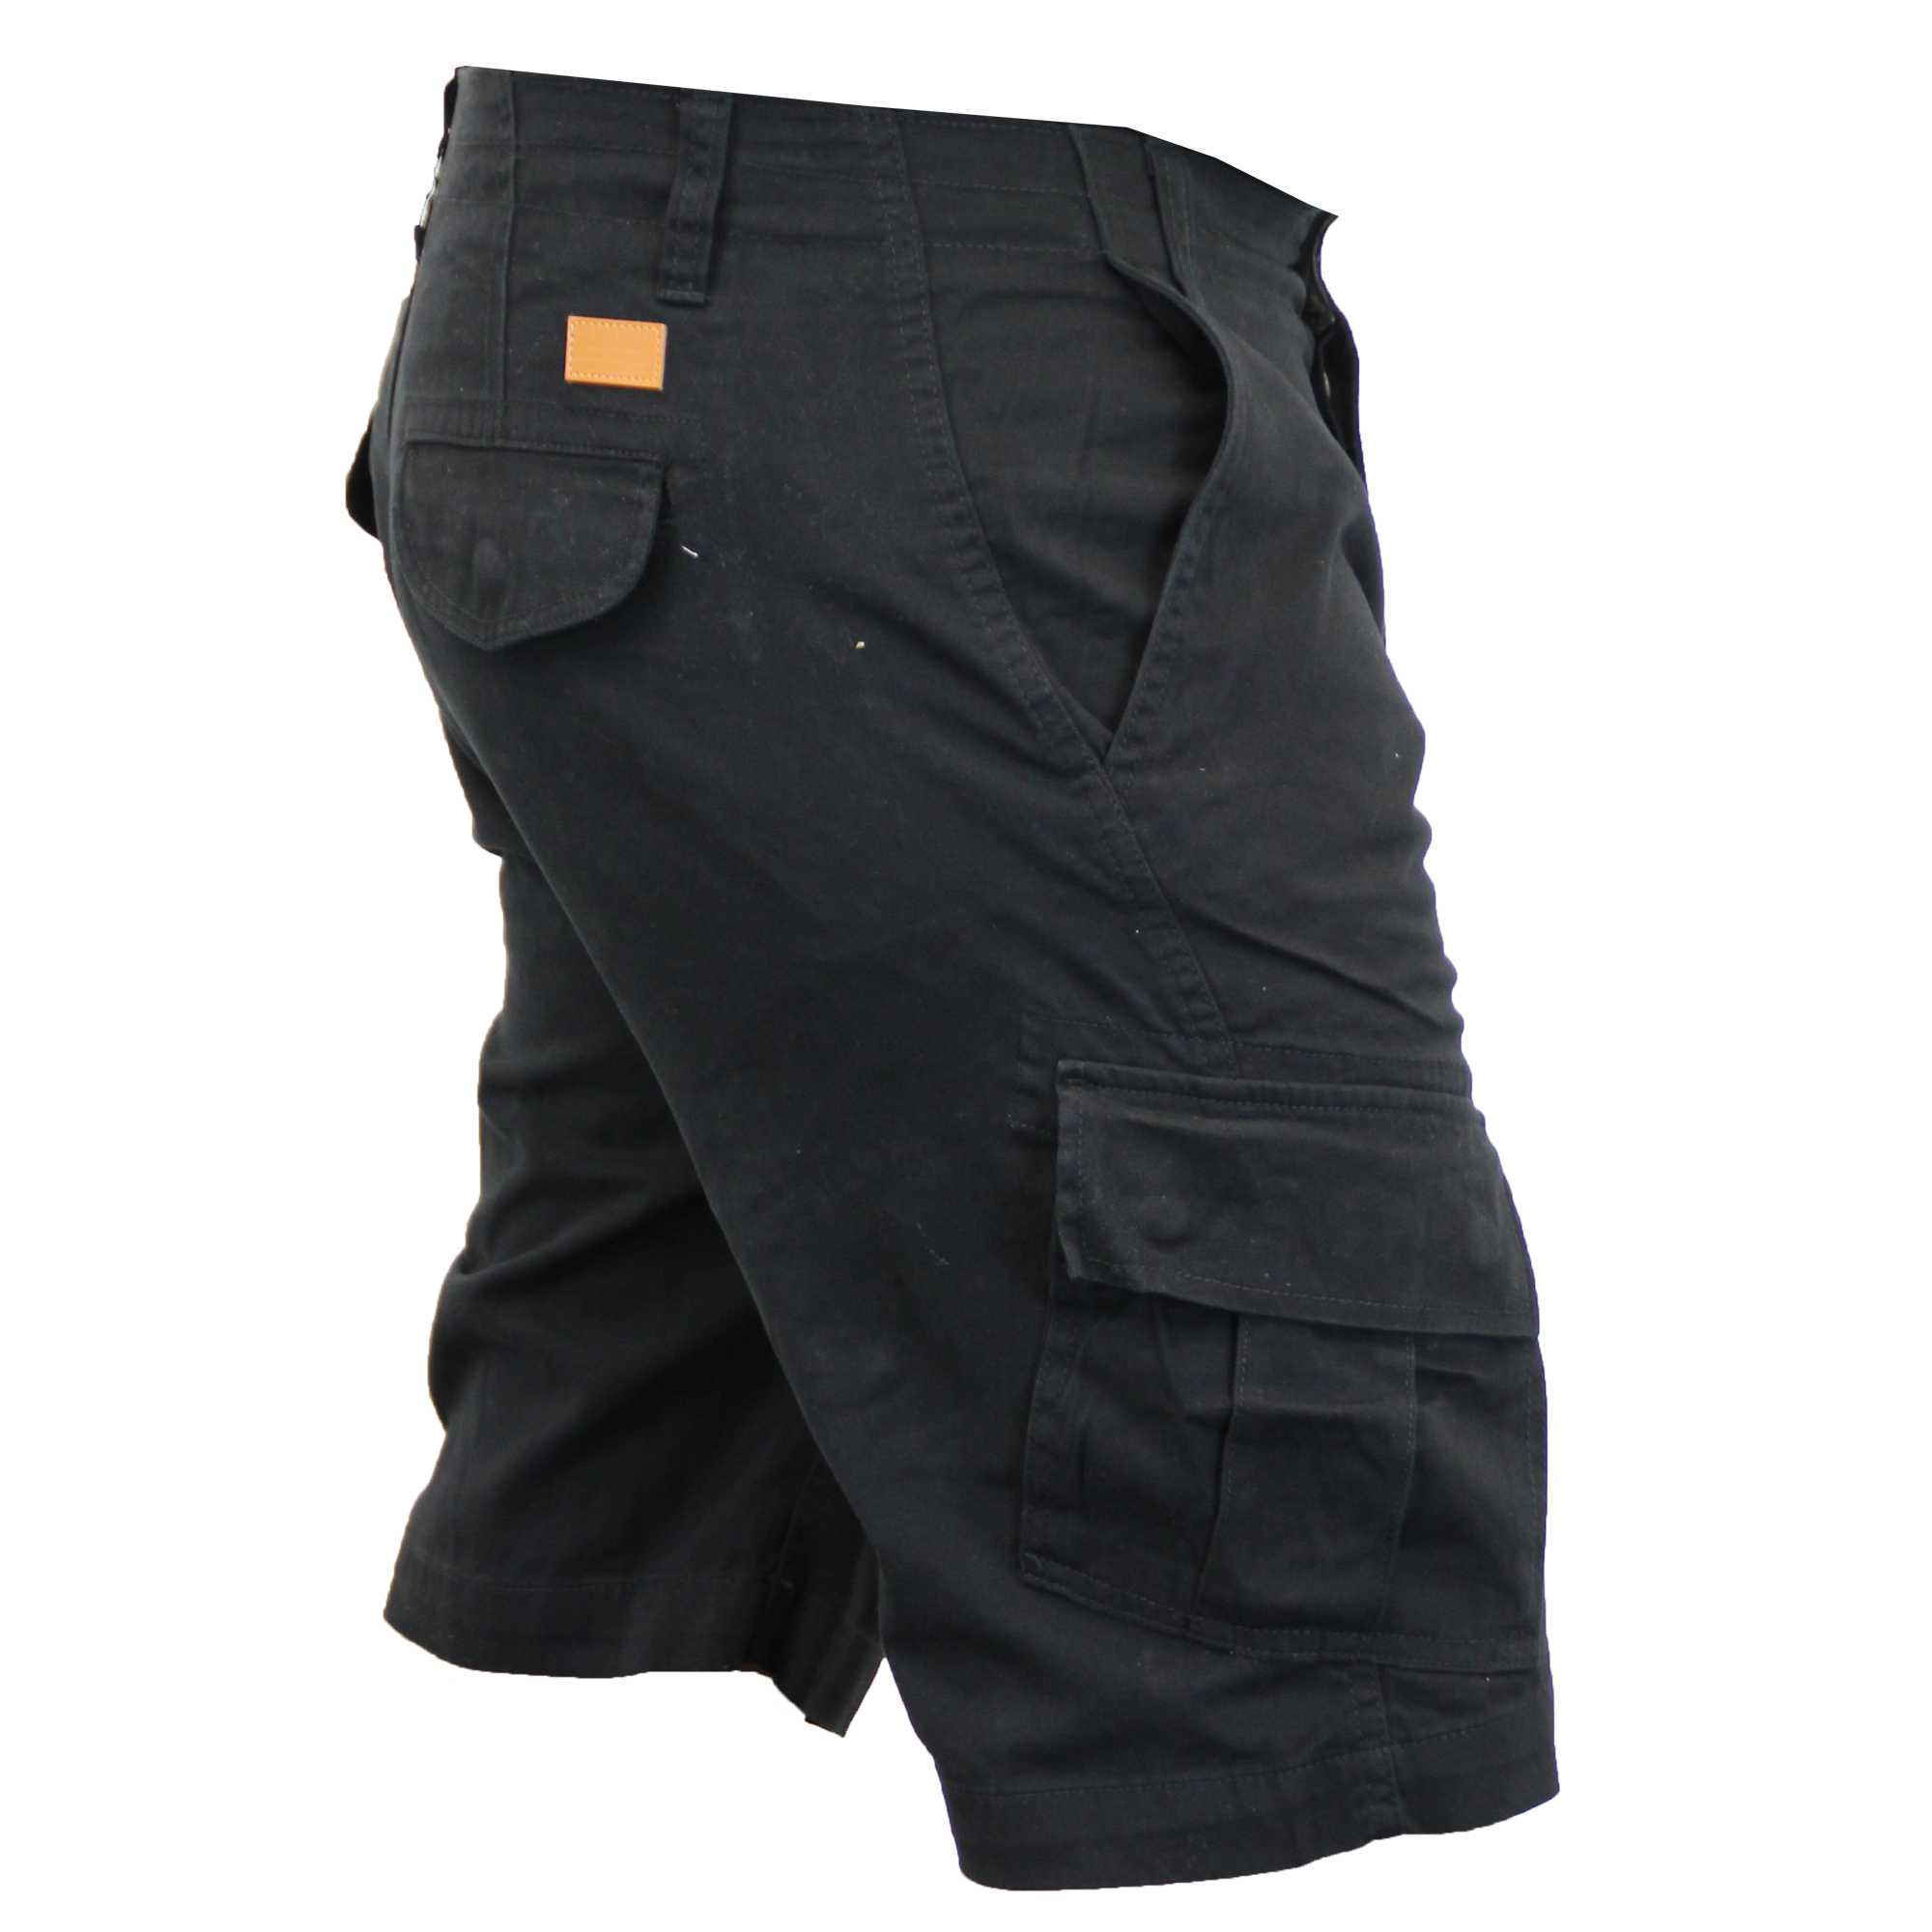 Mens-Cargo-Chino-Shorts-Threadbare-Combat-Knee-Length-Westace-Military-Summer thumbnail 3